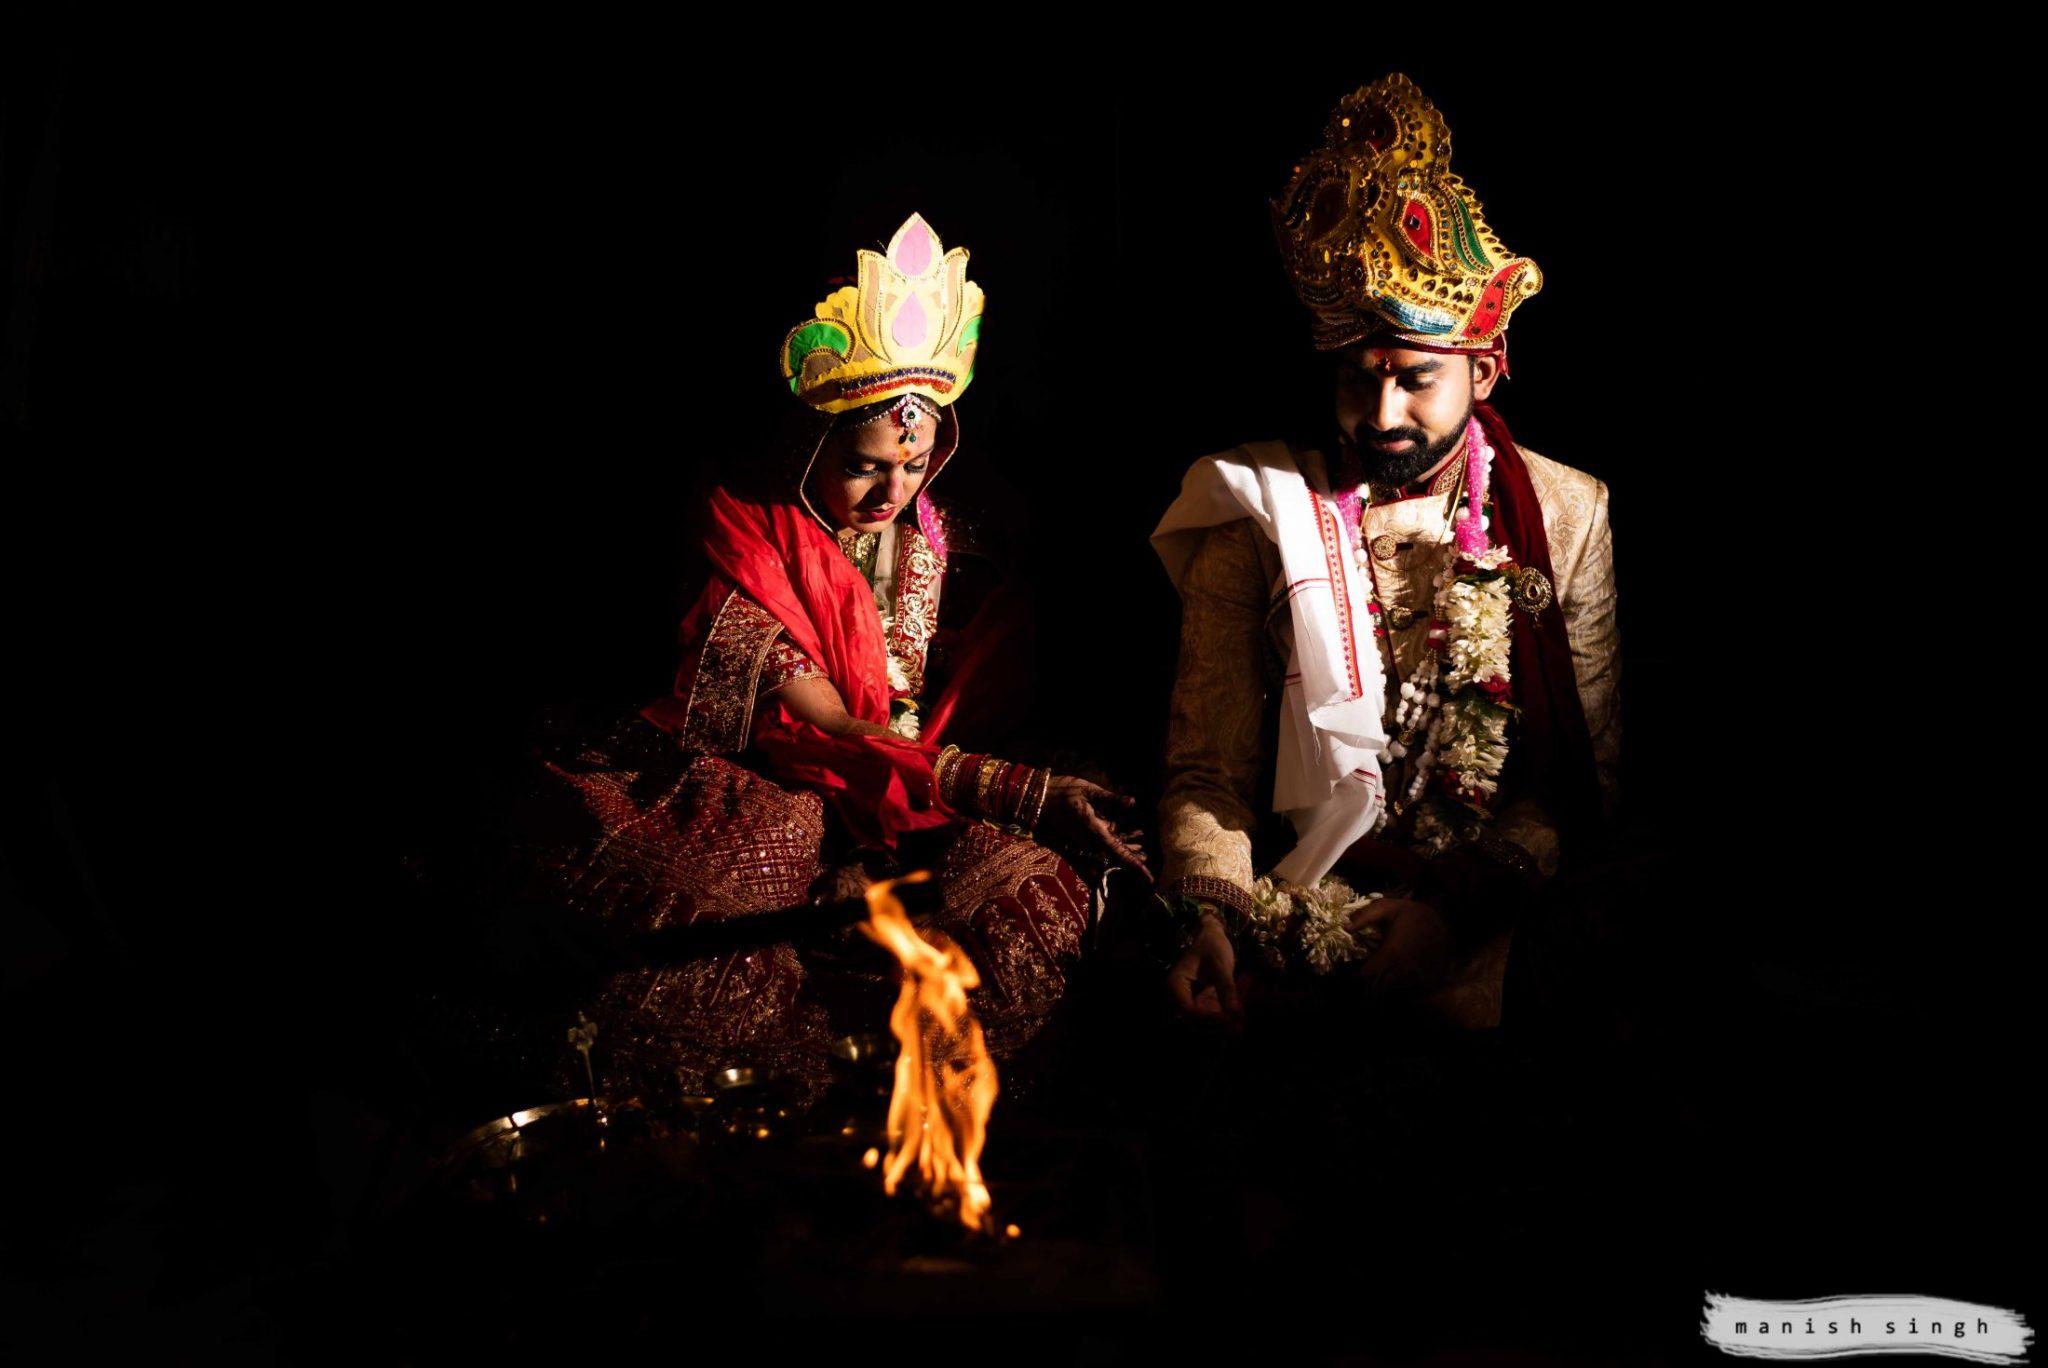 couple photo during hindu marriage ritual